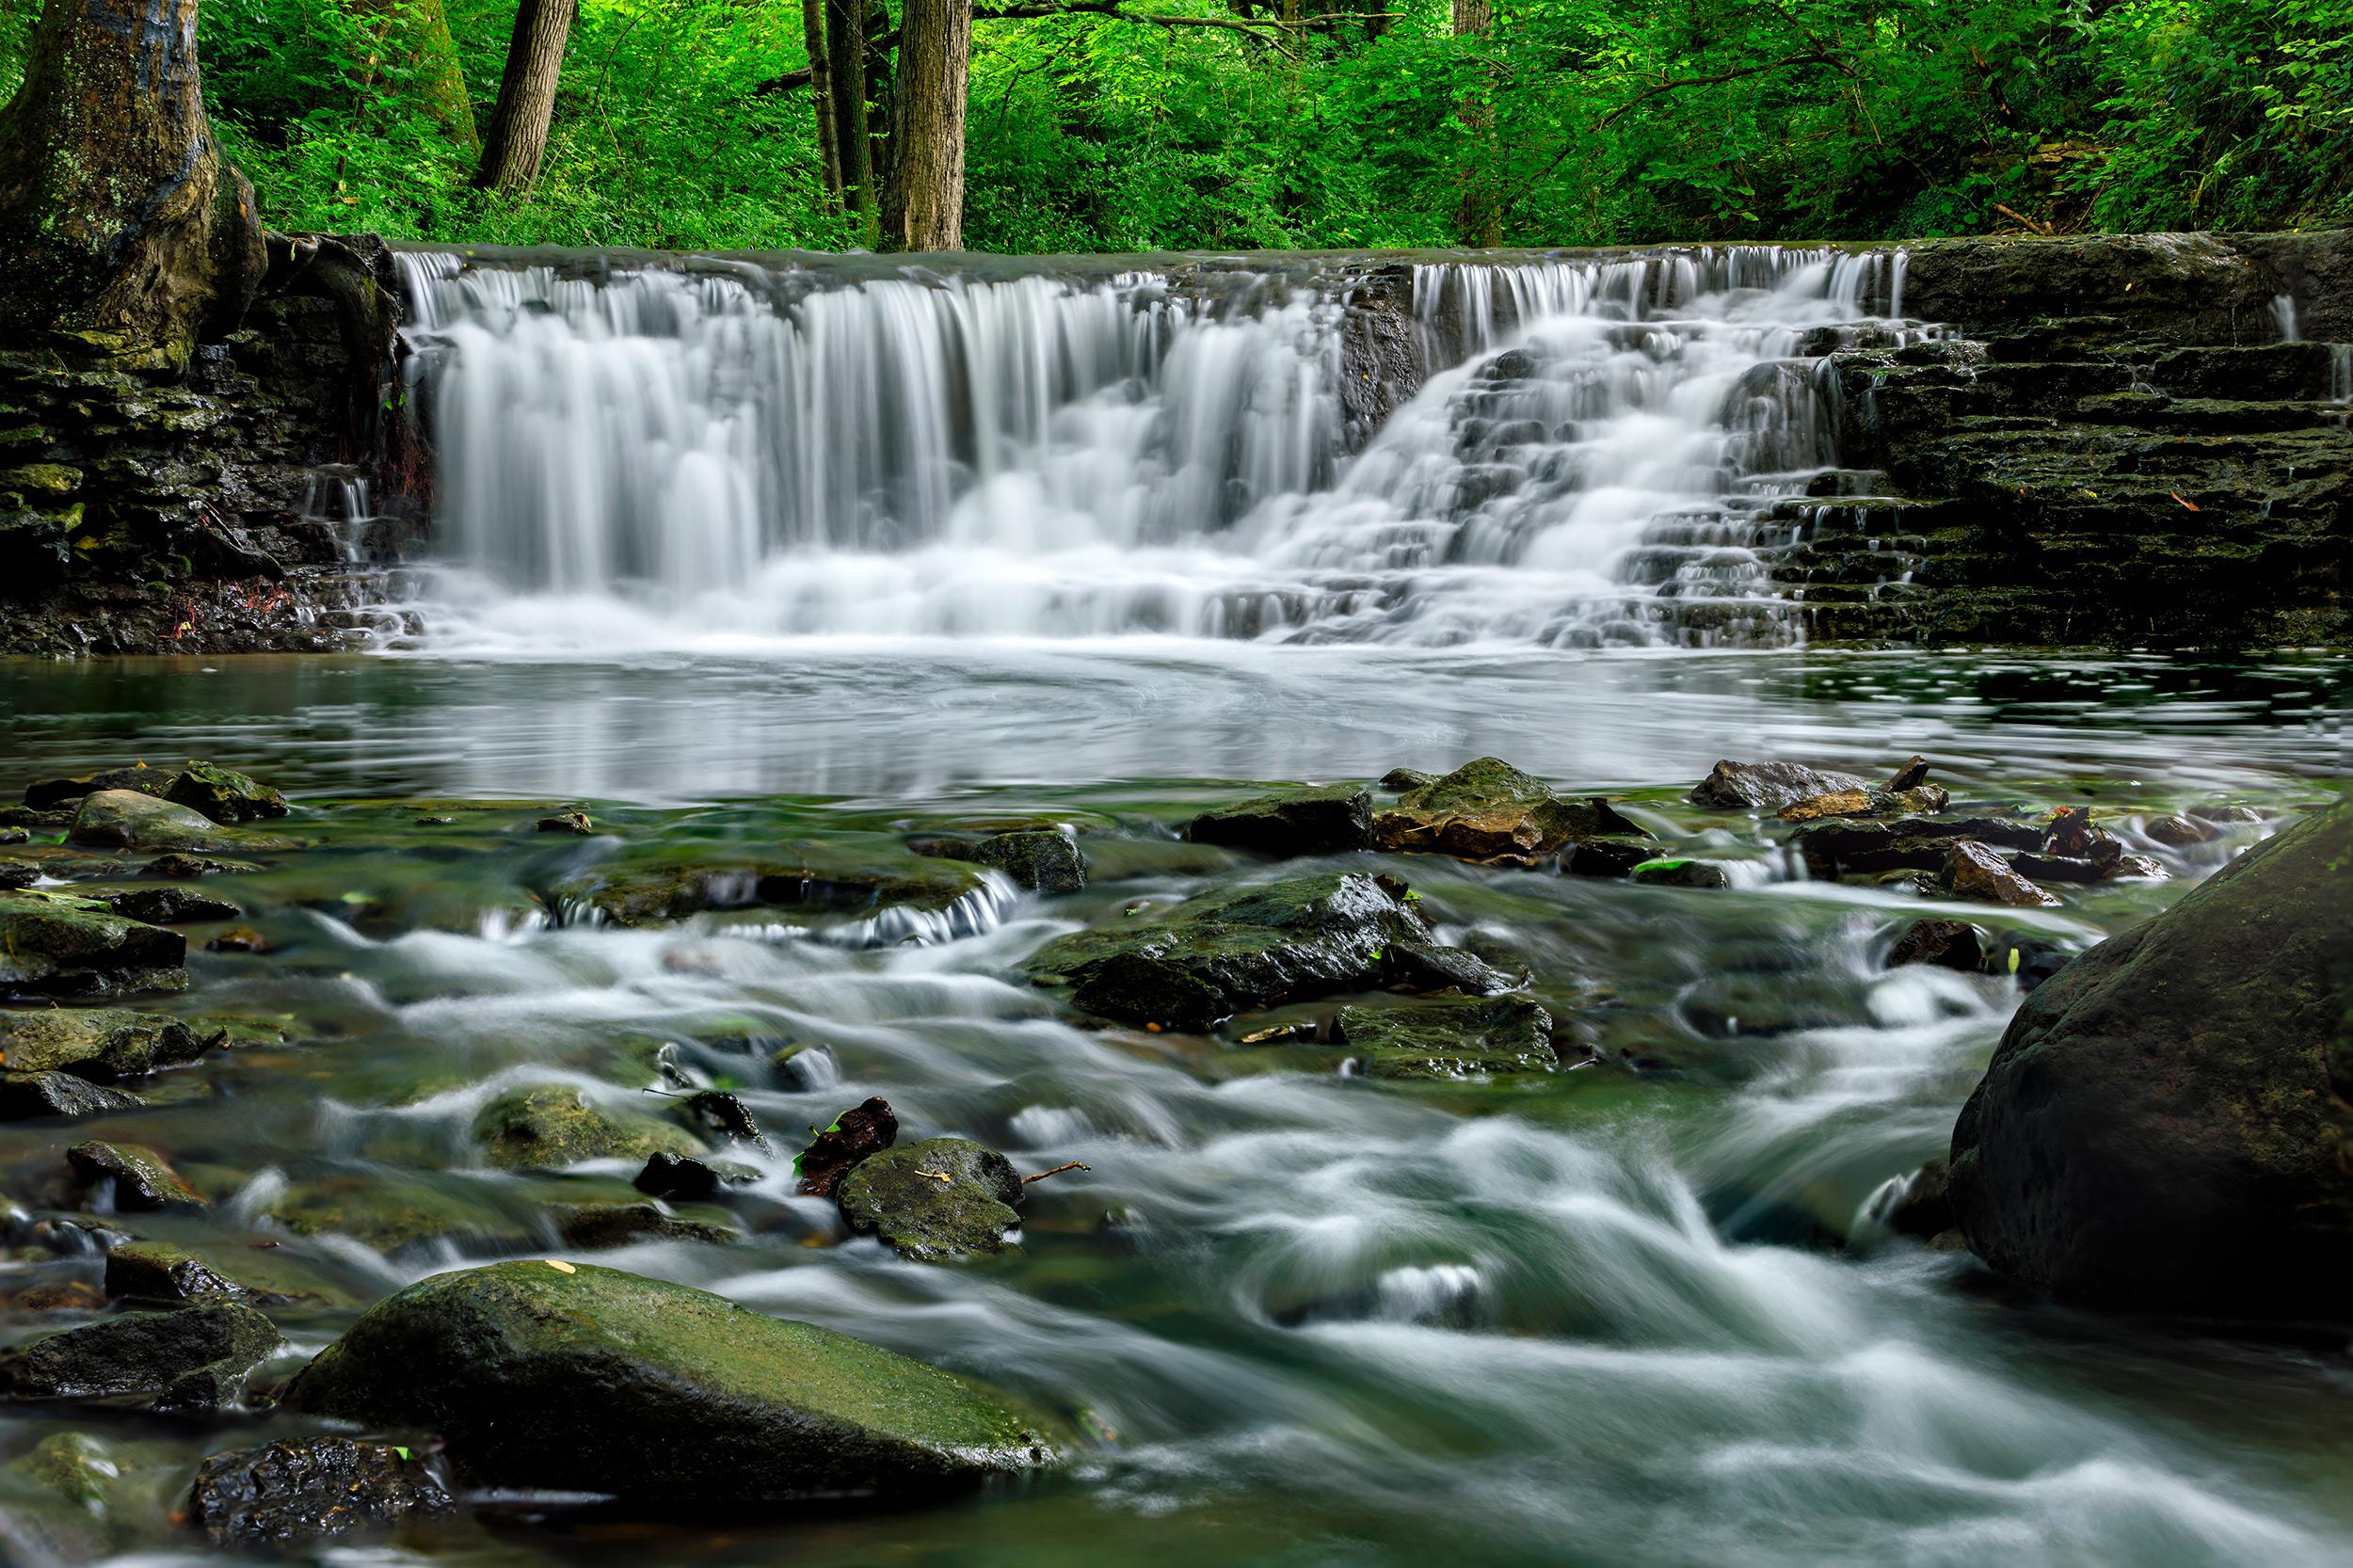 Hilliard-Waterfalls-Summer-2017-065-Edit-Edit-2-Edit.jpg